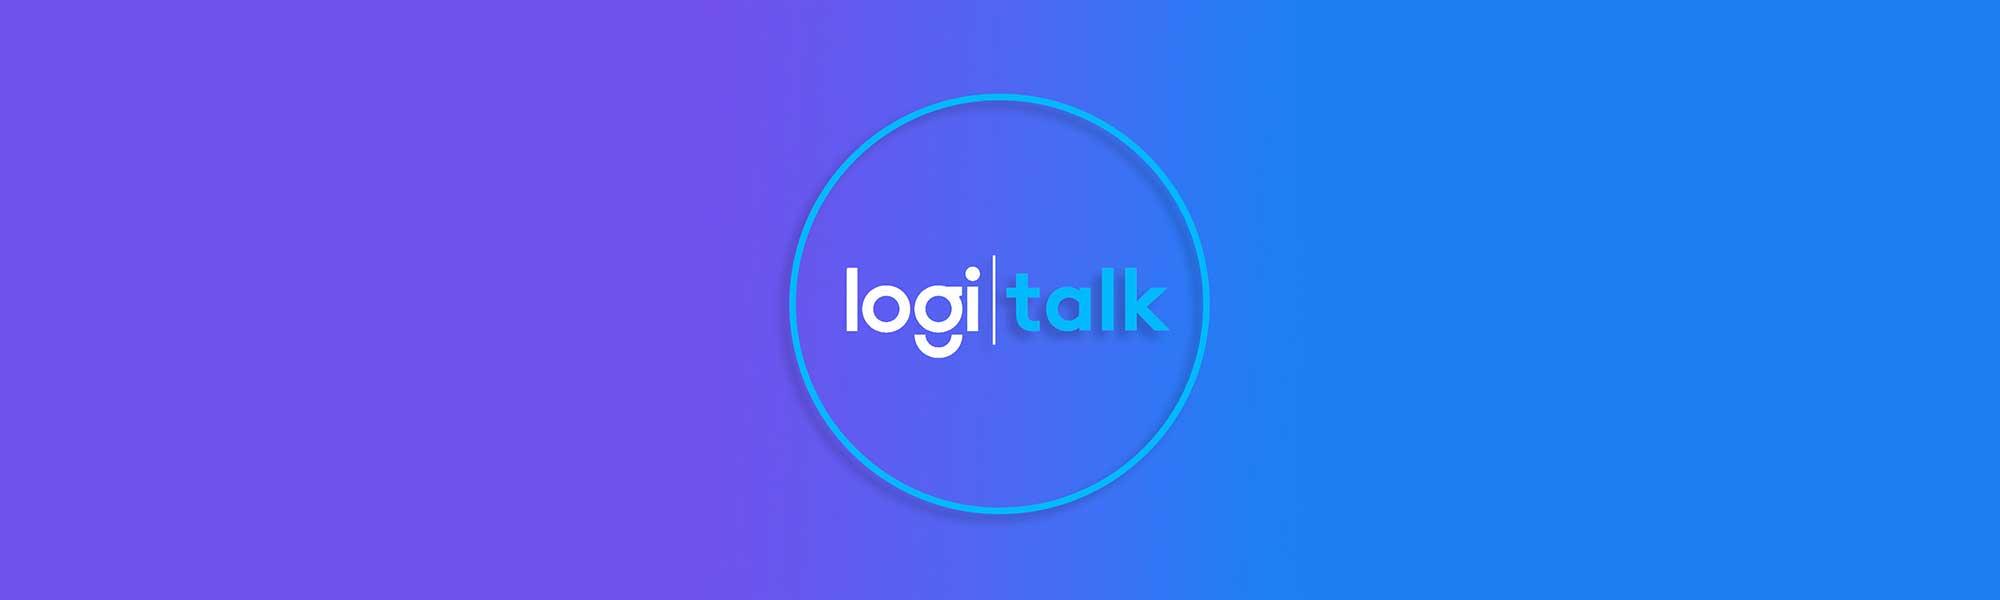 Logitech Launches LogiTalk Interview Series